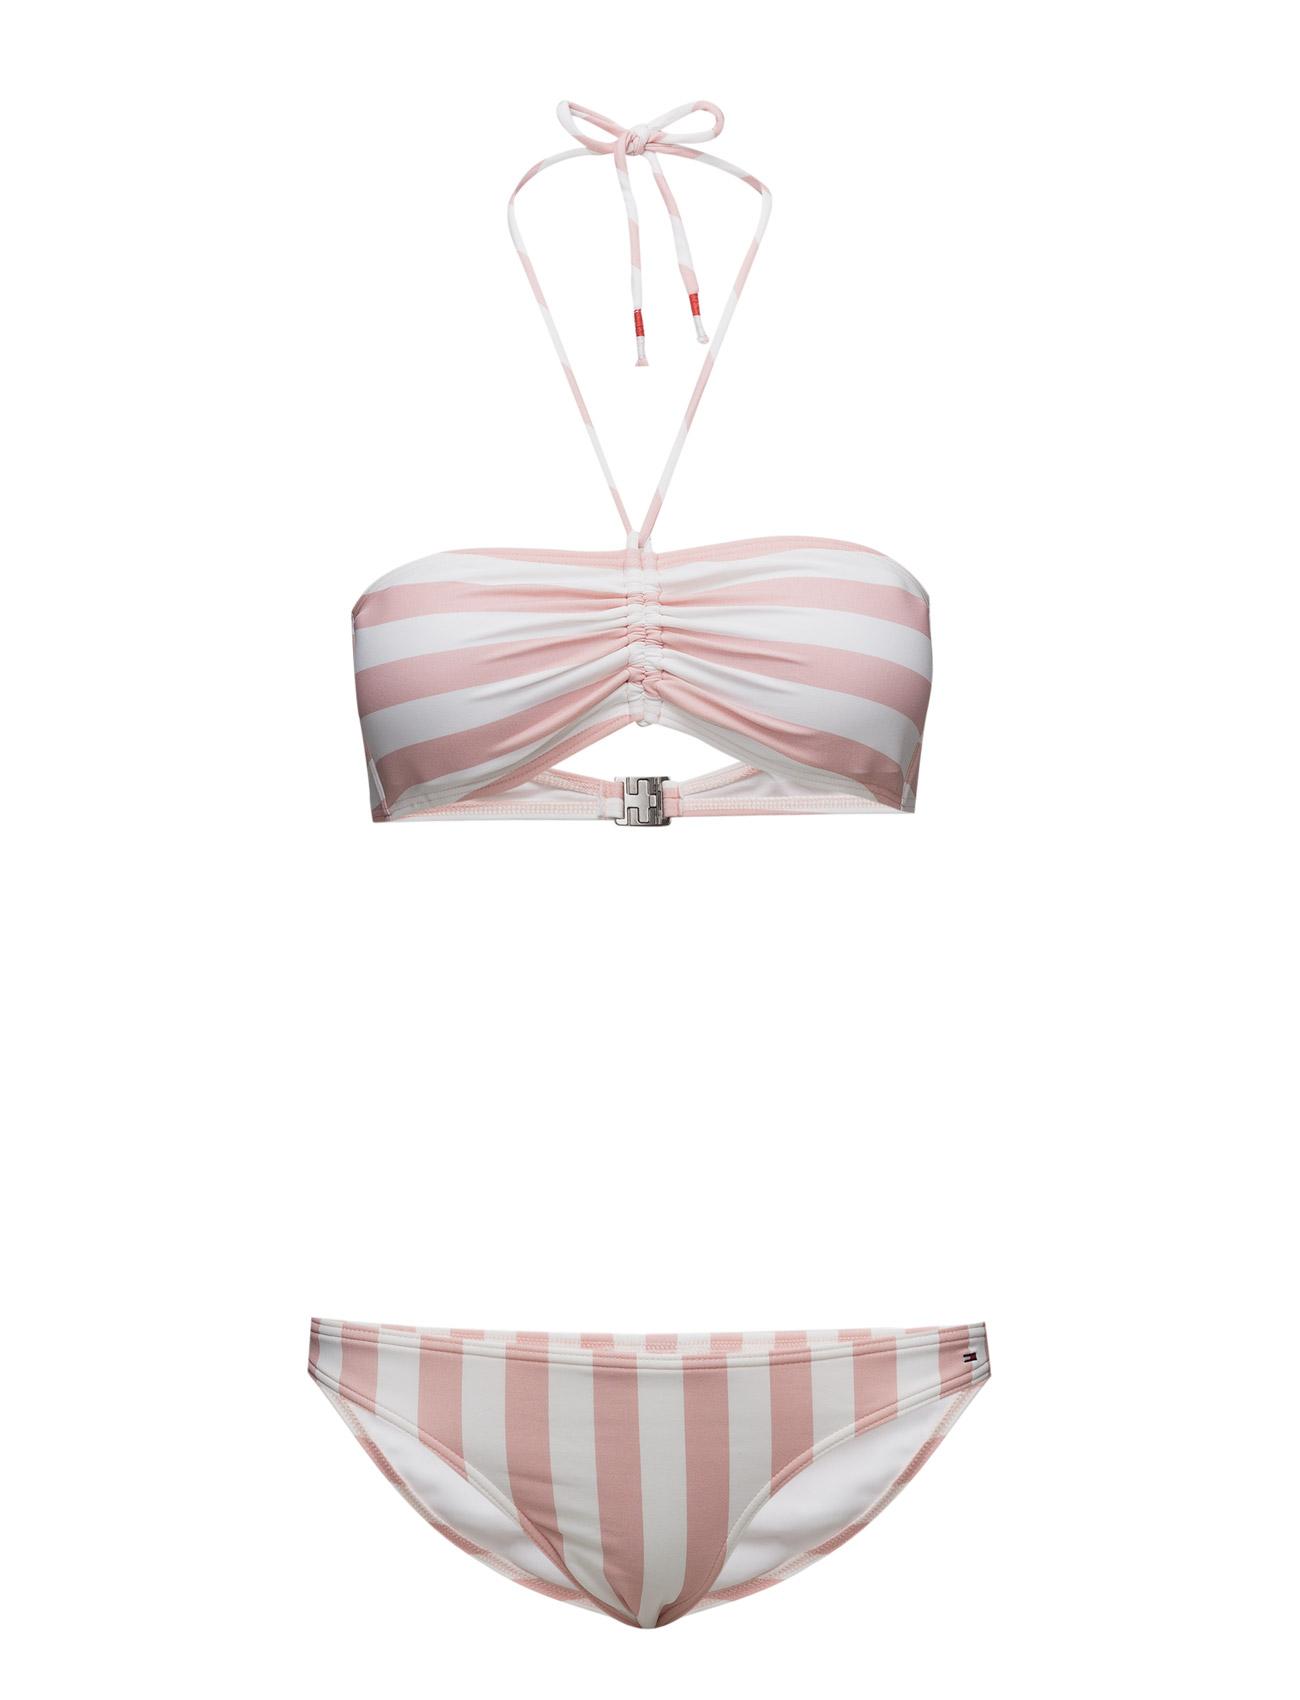 Thdw Stripe Bikini 11 Hilfiger Denim Bikinier til Kvinder i Lyserød